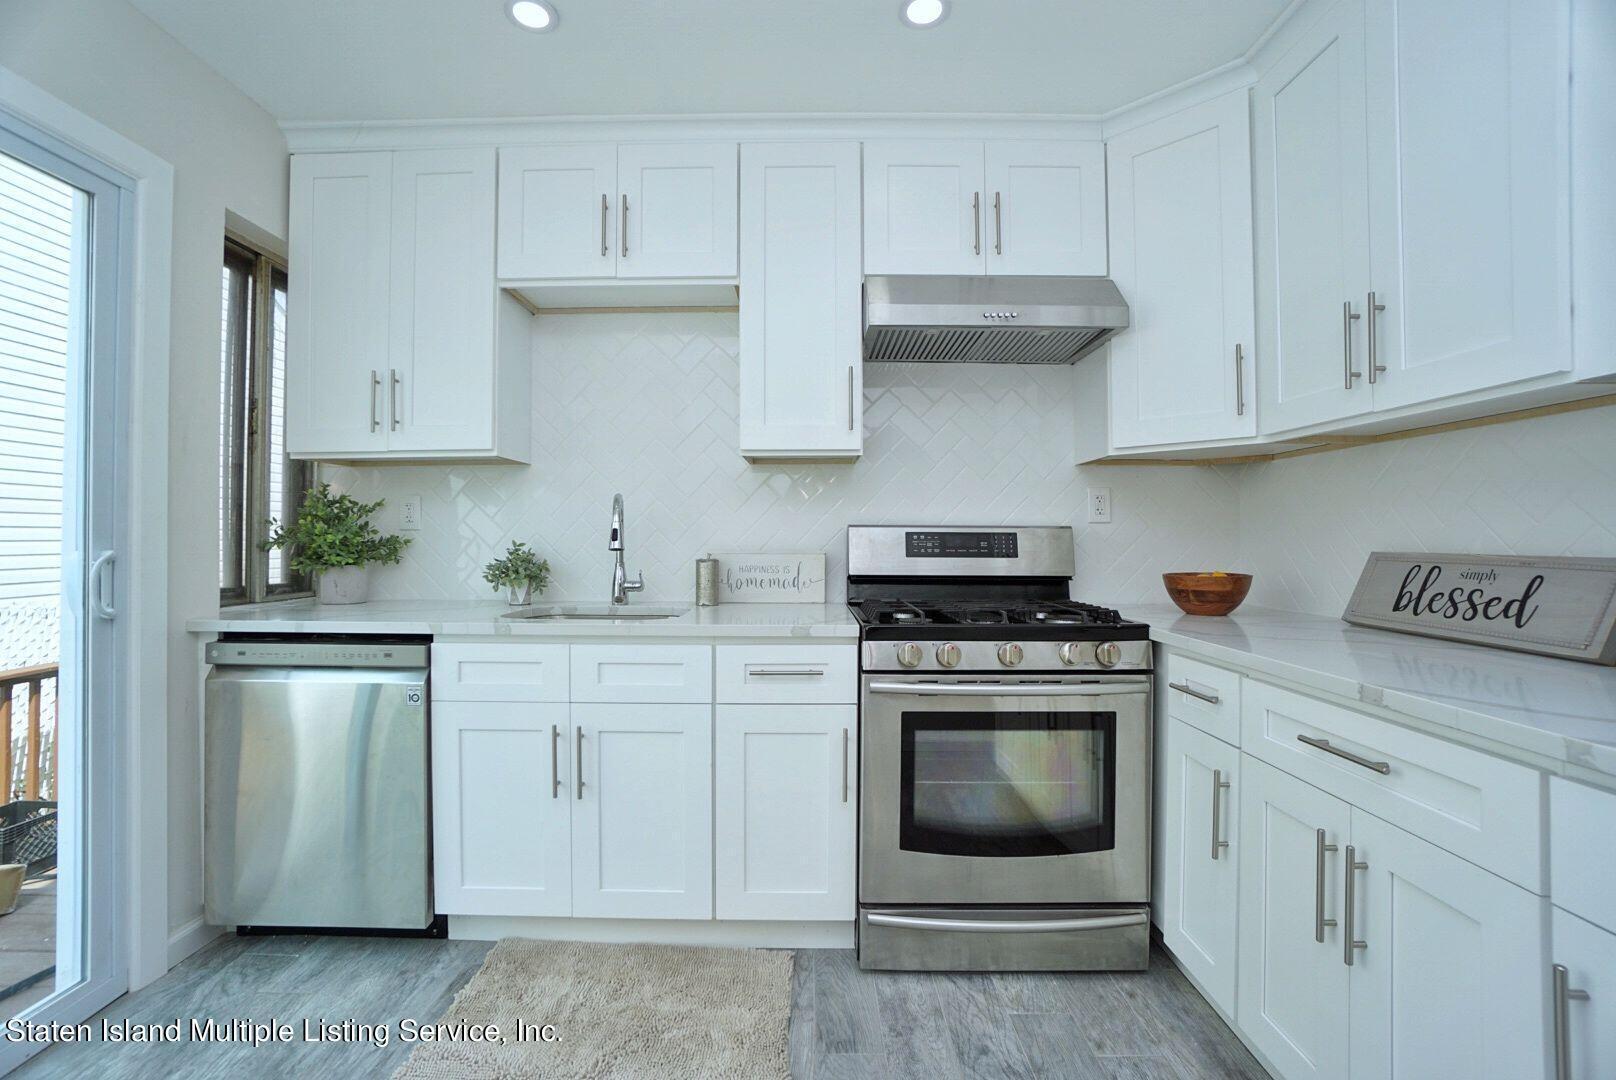 Single Family - Detached 83 Boylan Street  Staten Island, NY 10312, MLS-1149266-8